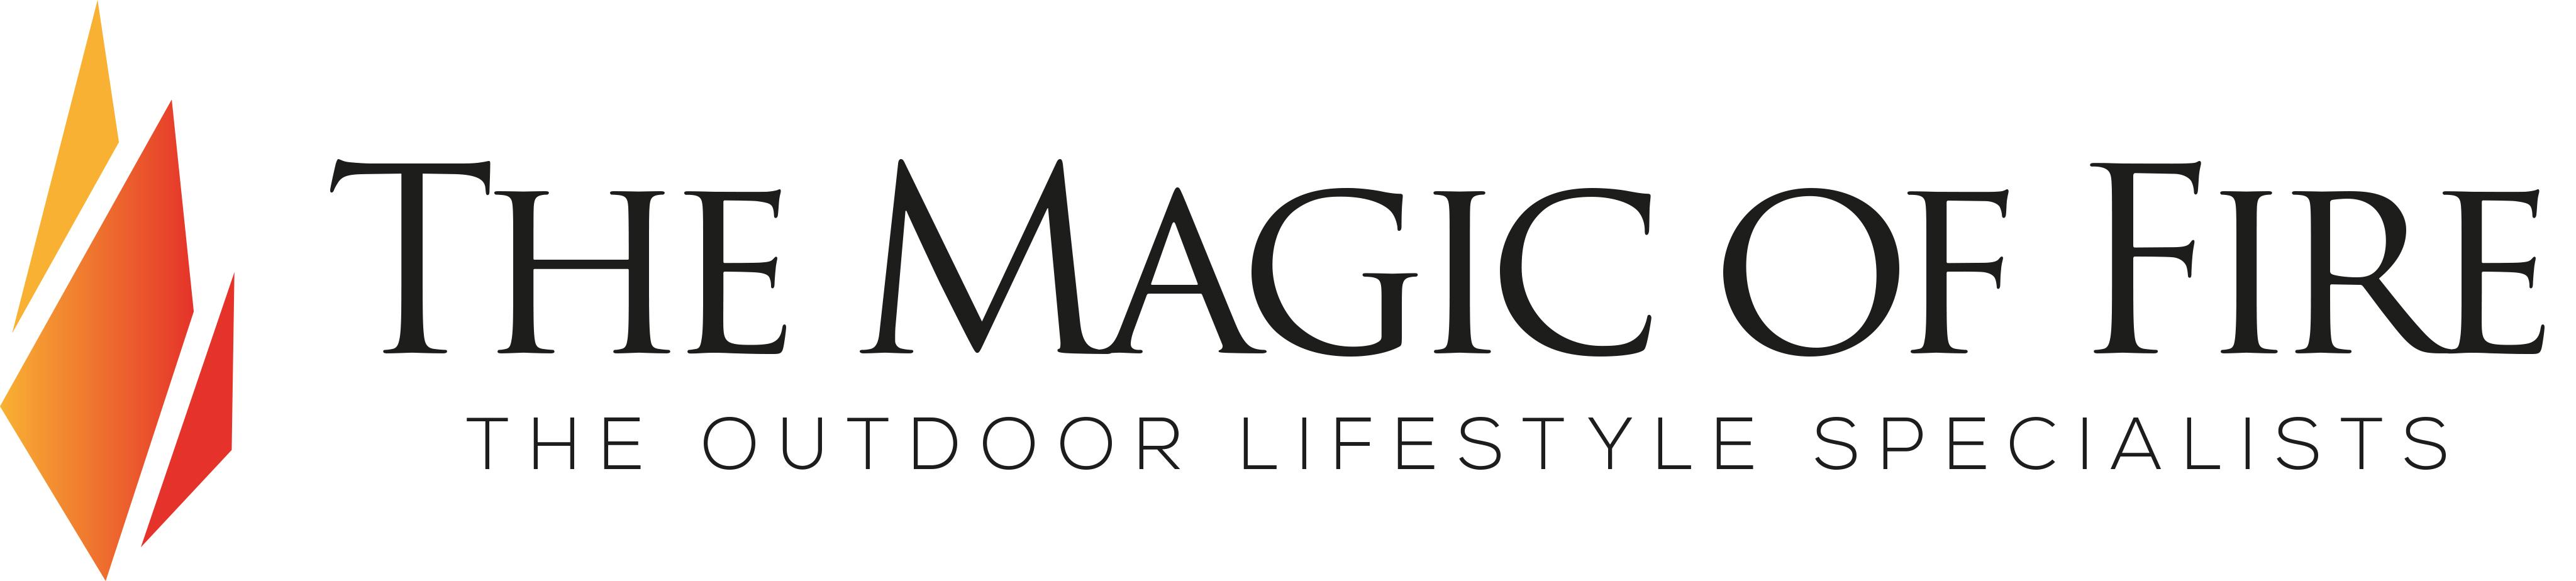 The Magic of Fire Logo